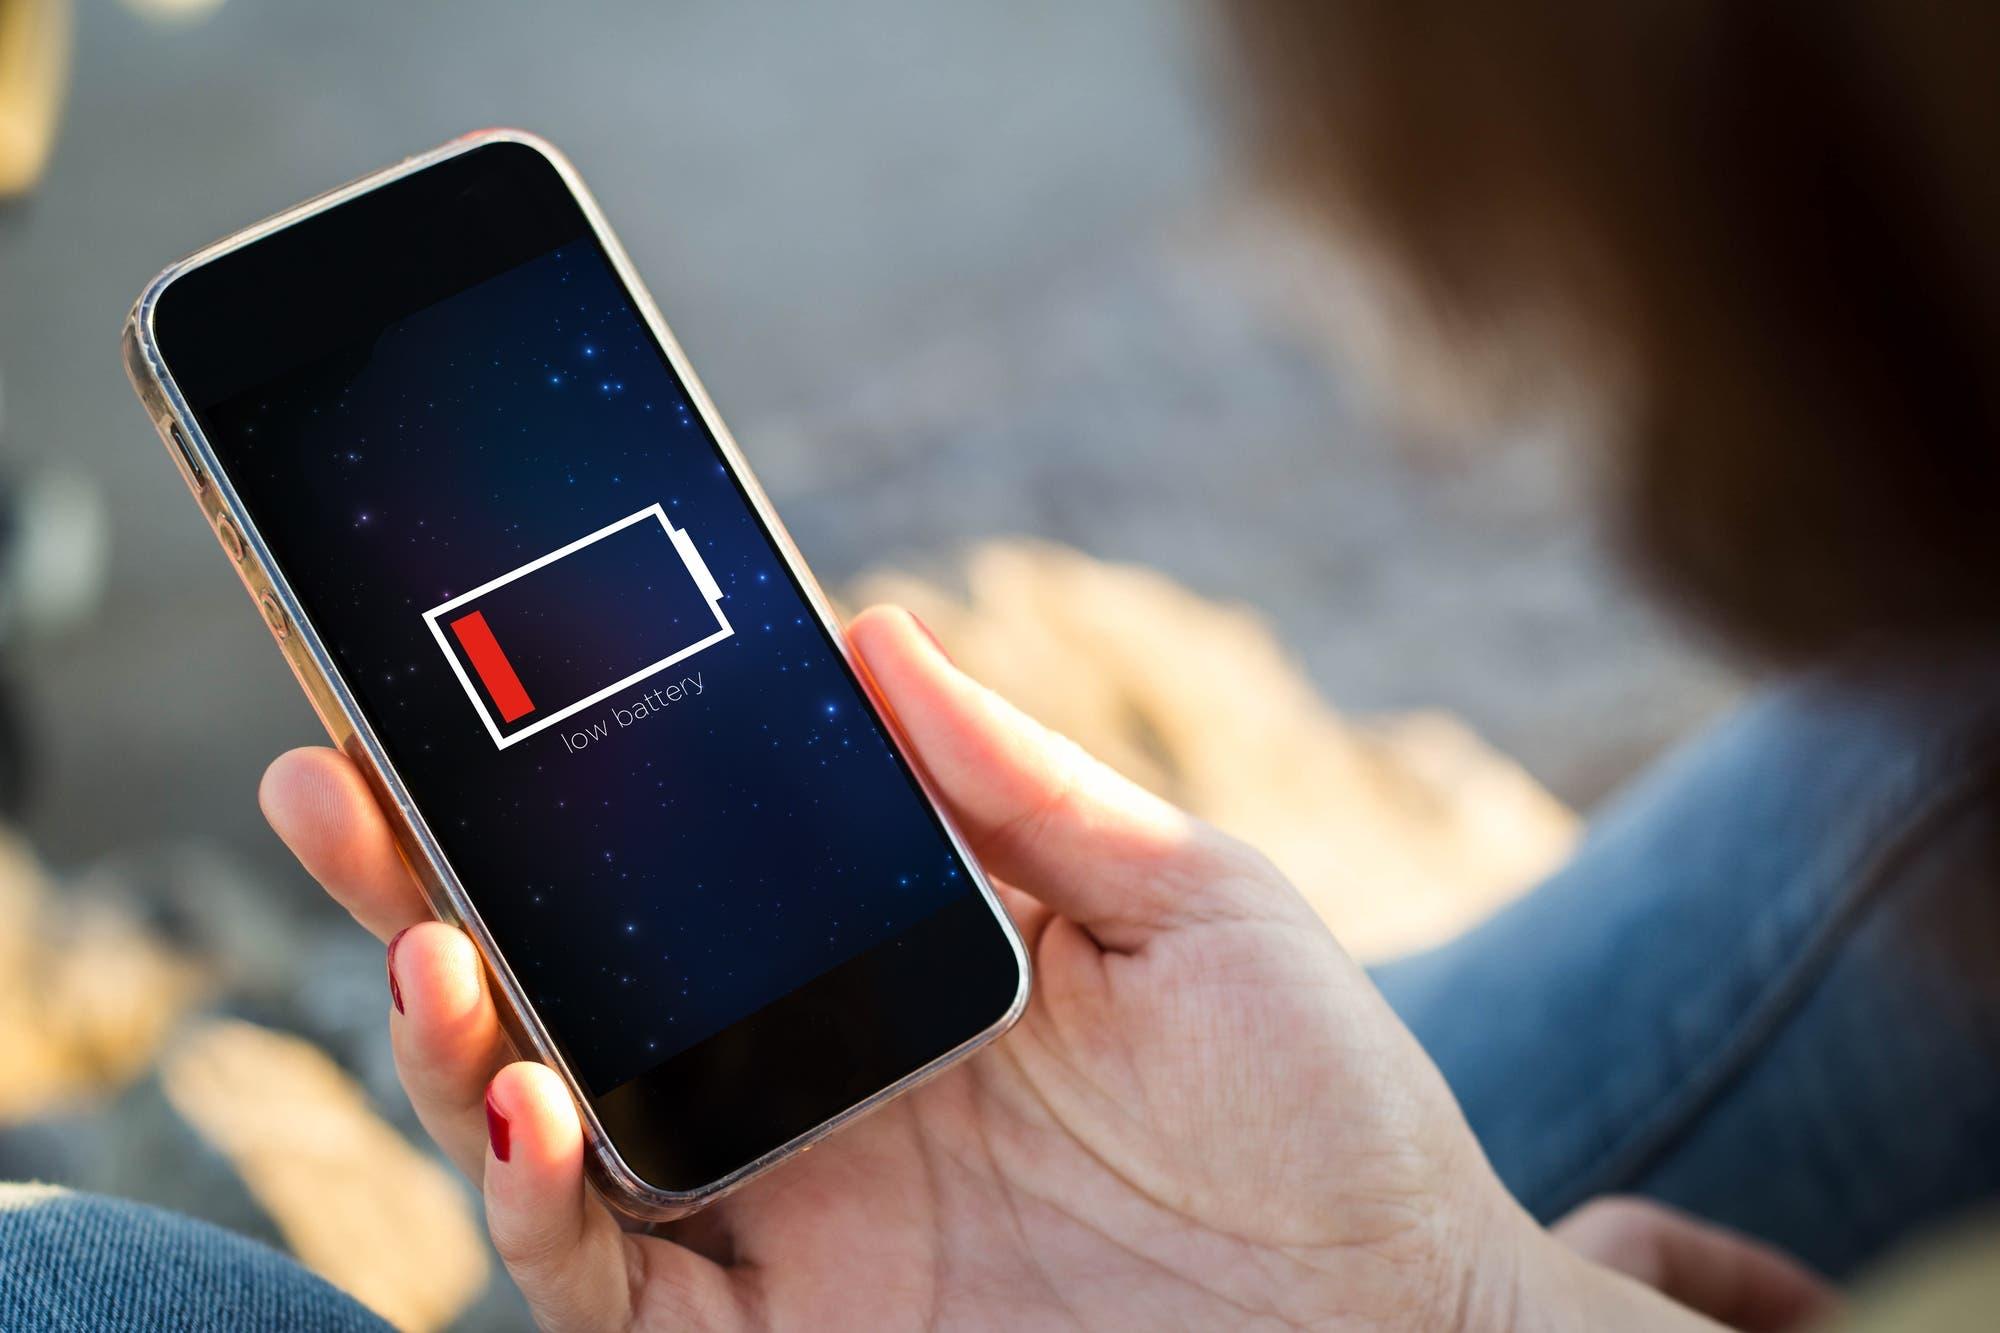 Huawei dice que en unos años vas a poder cargar tu celular con un láser